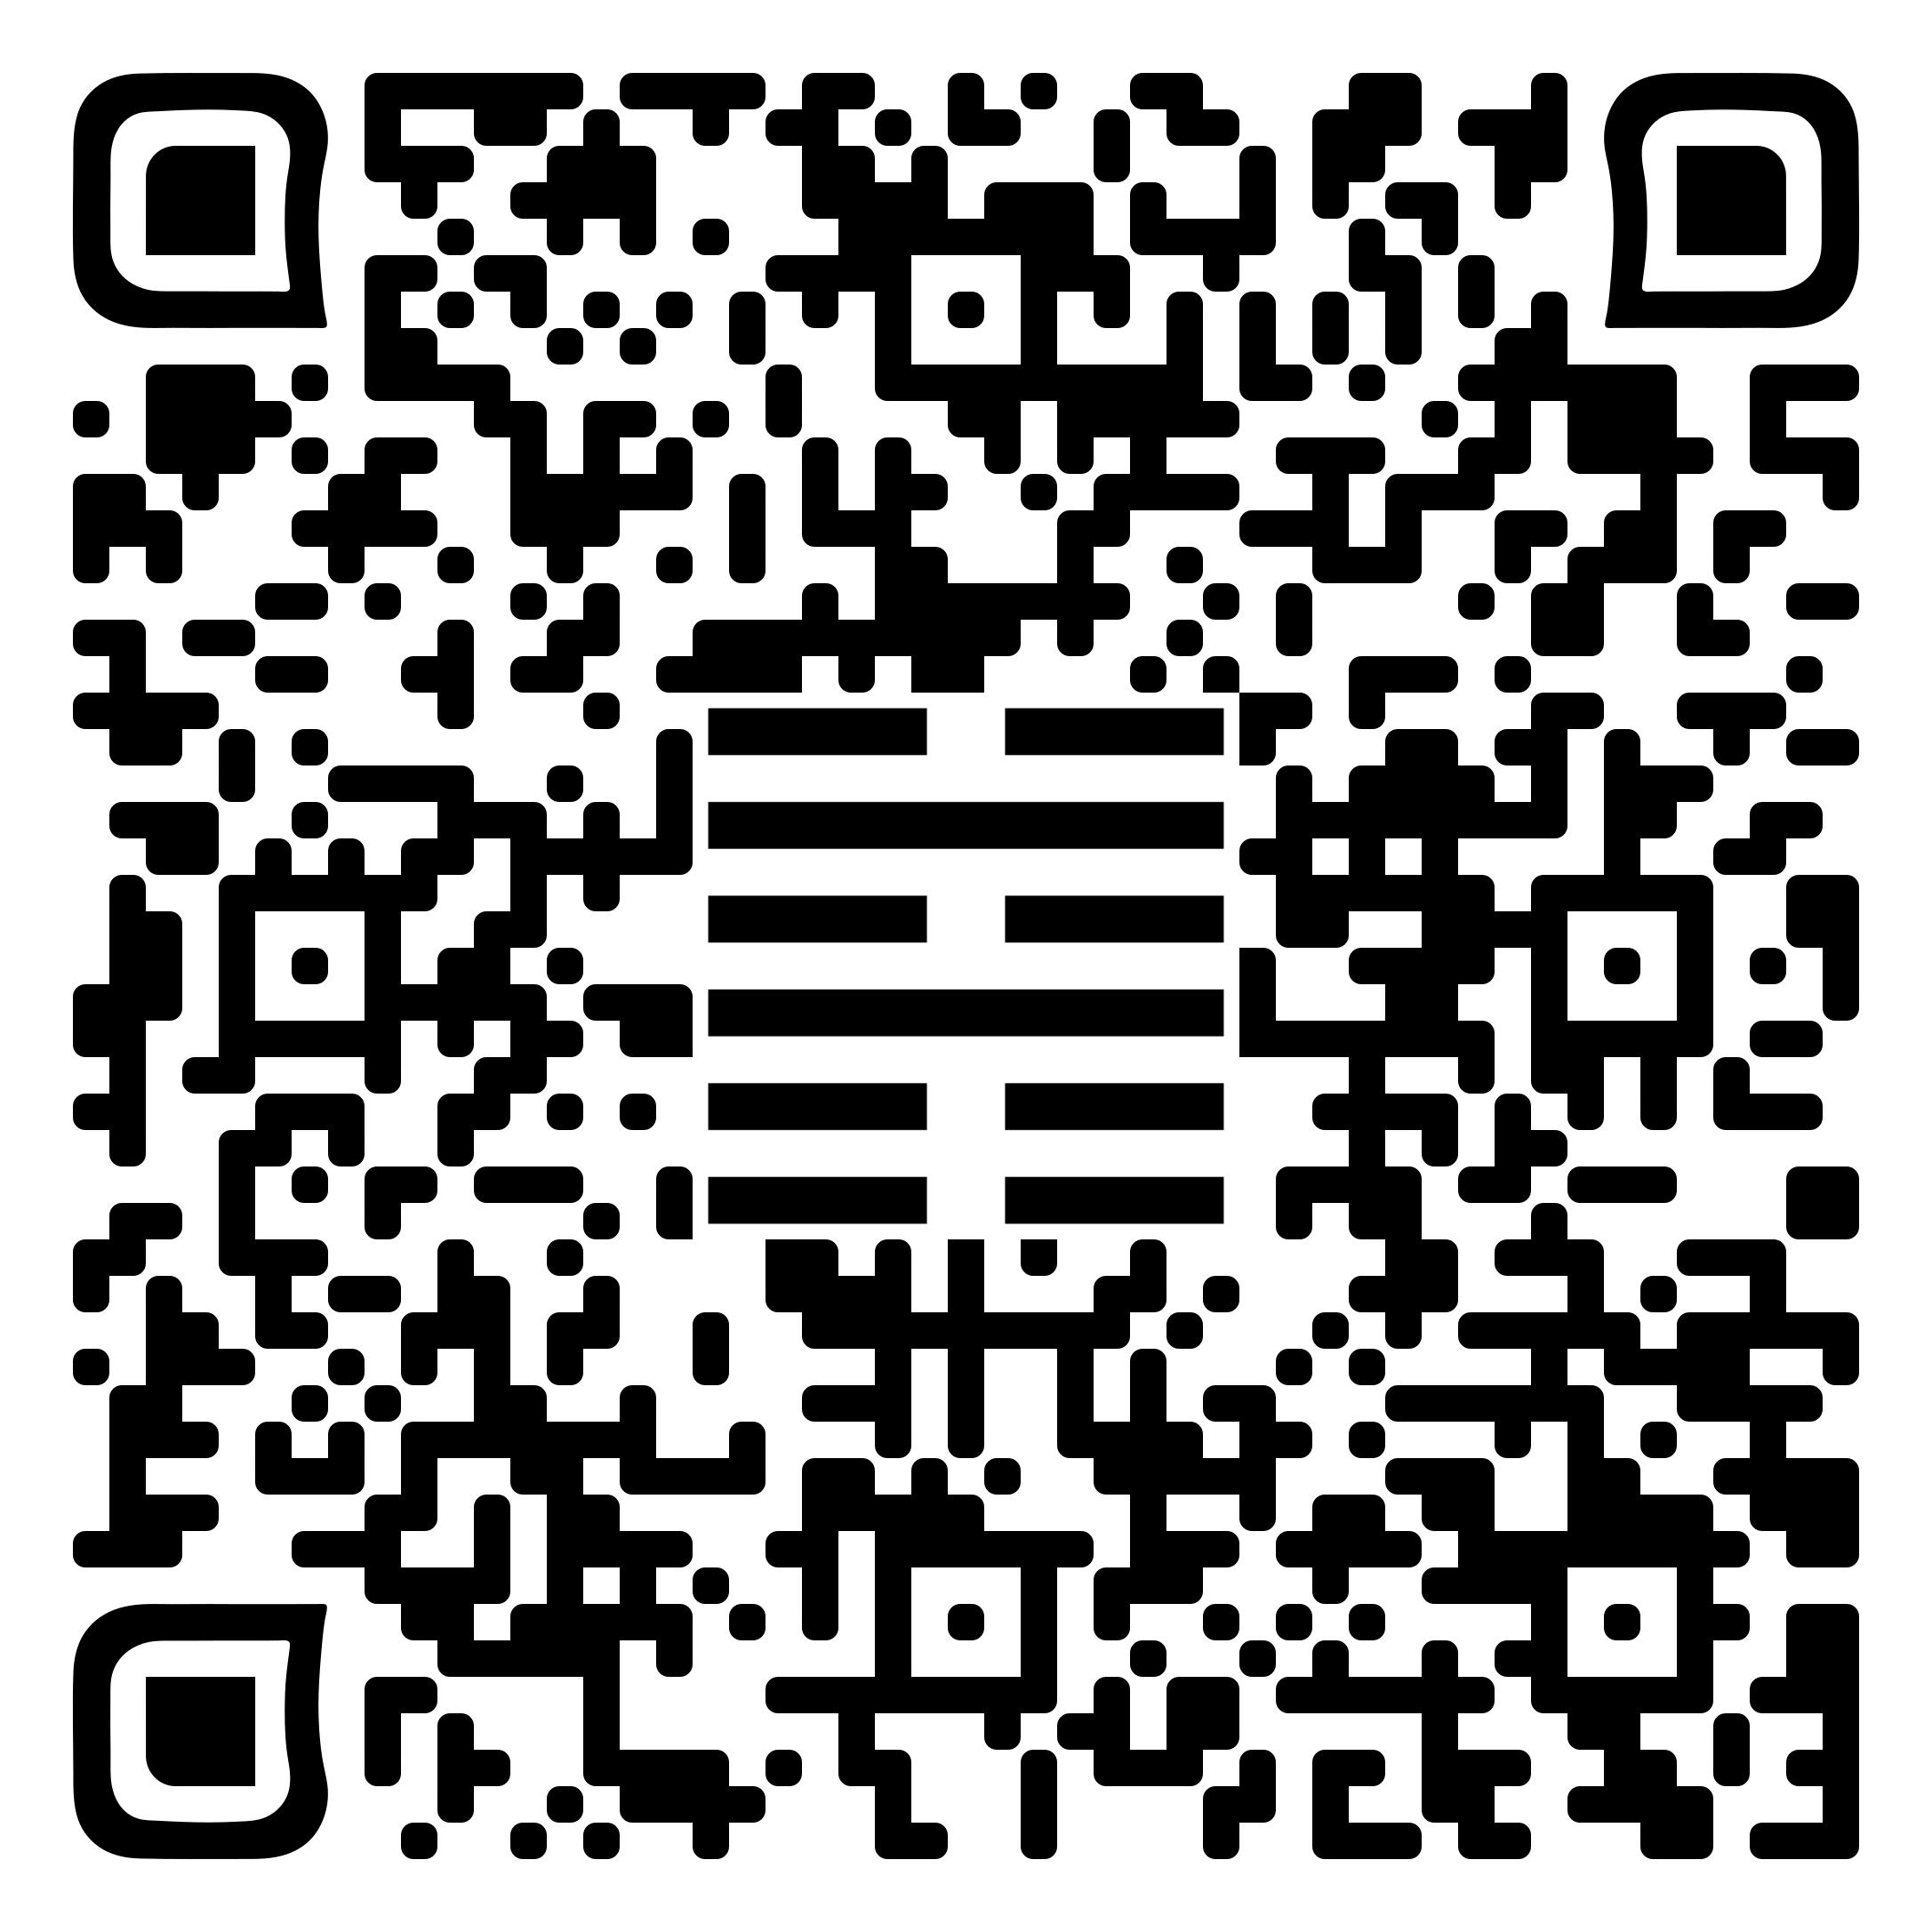 qr-code-39.png